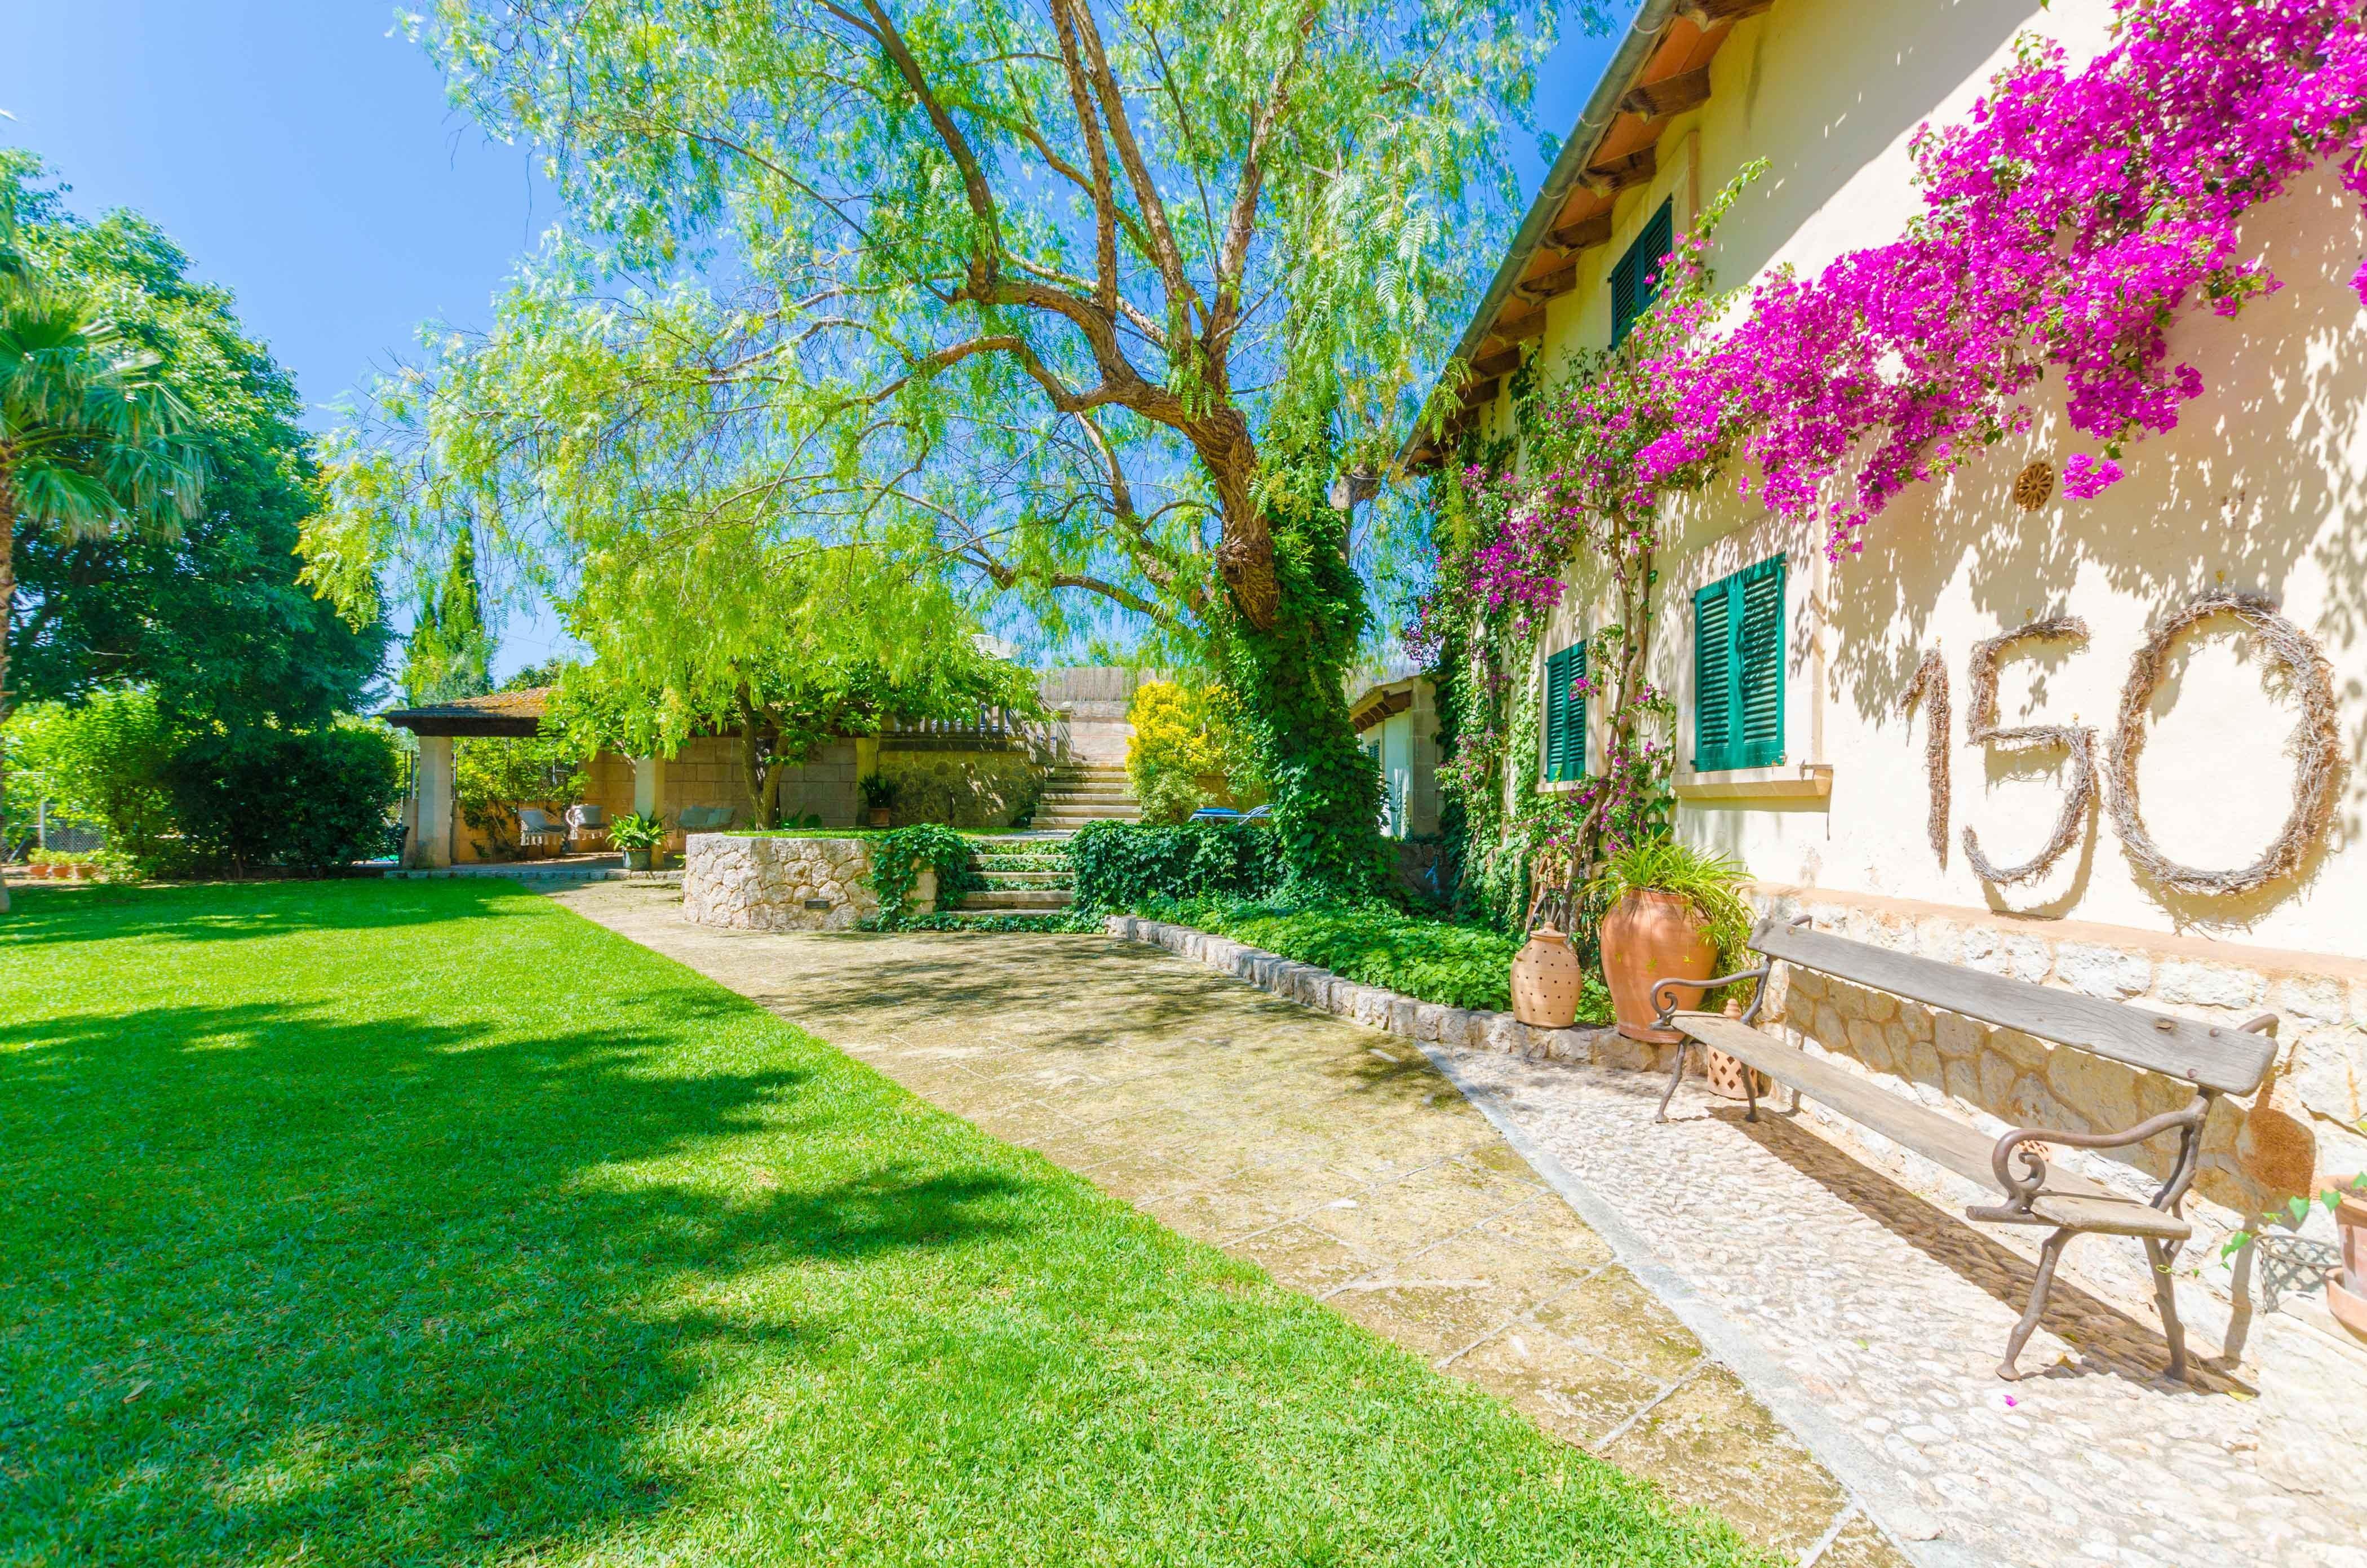 Maison de vacances CAS CONVIDATS (2435013), Alaro, Majorque, Iles Baléares, Espagne, image 66